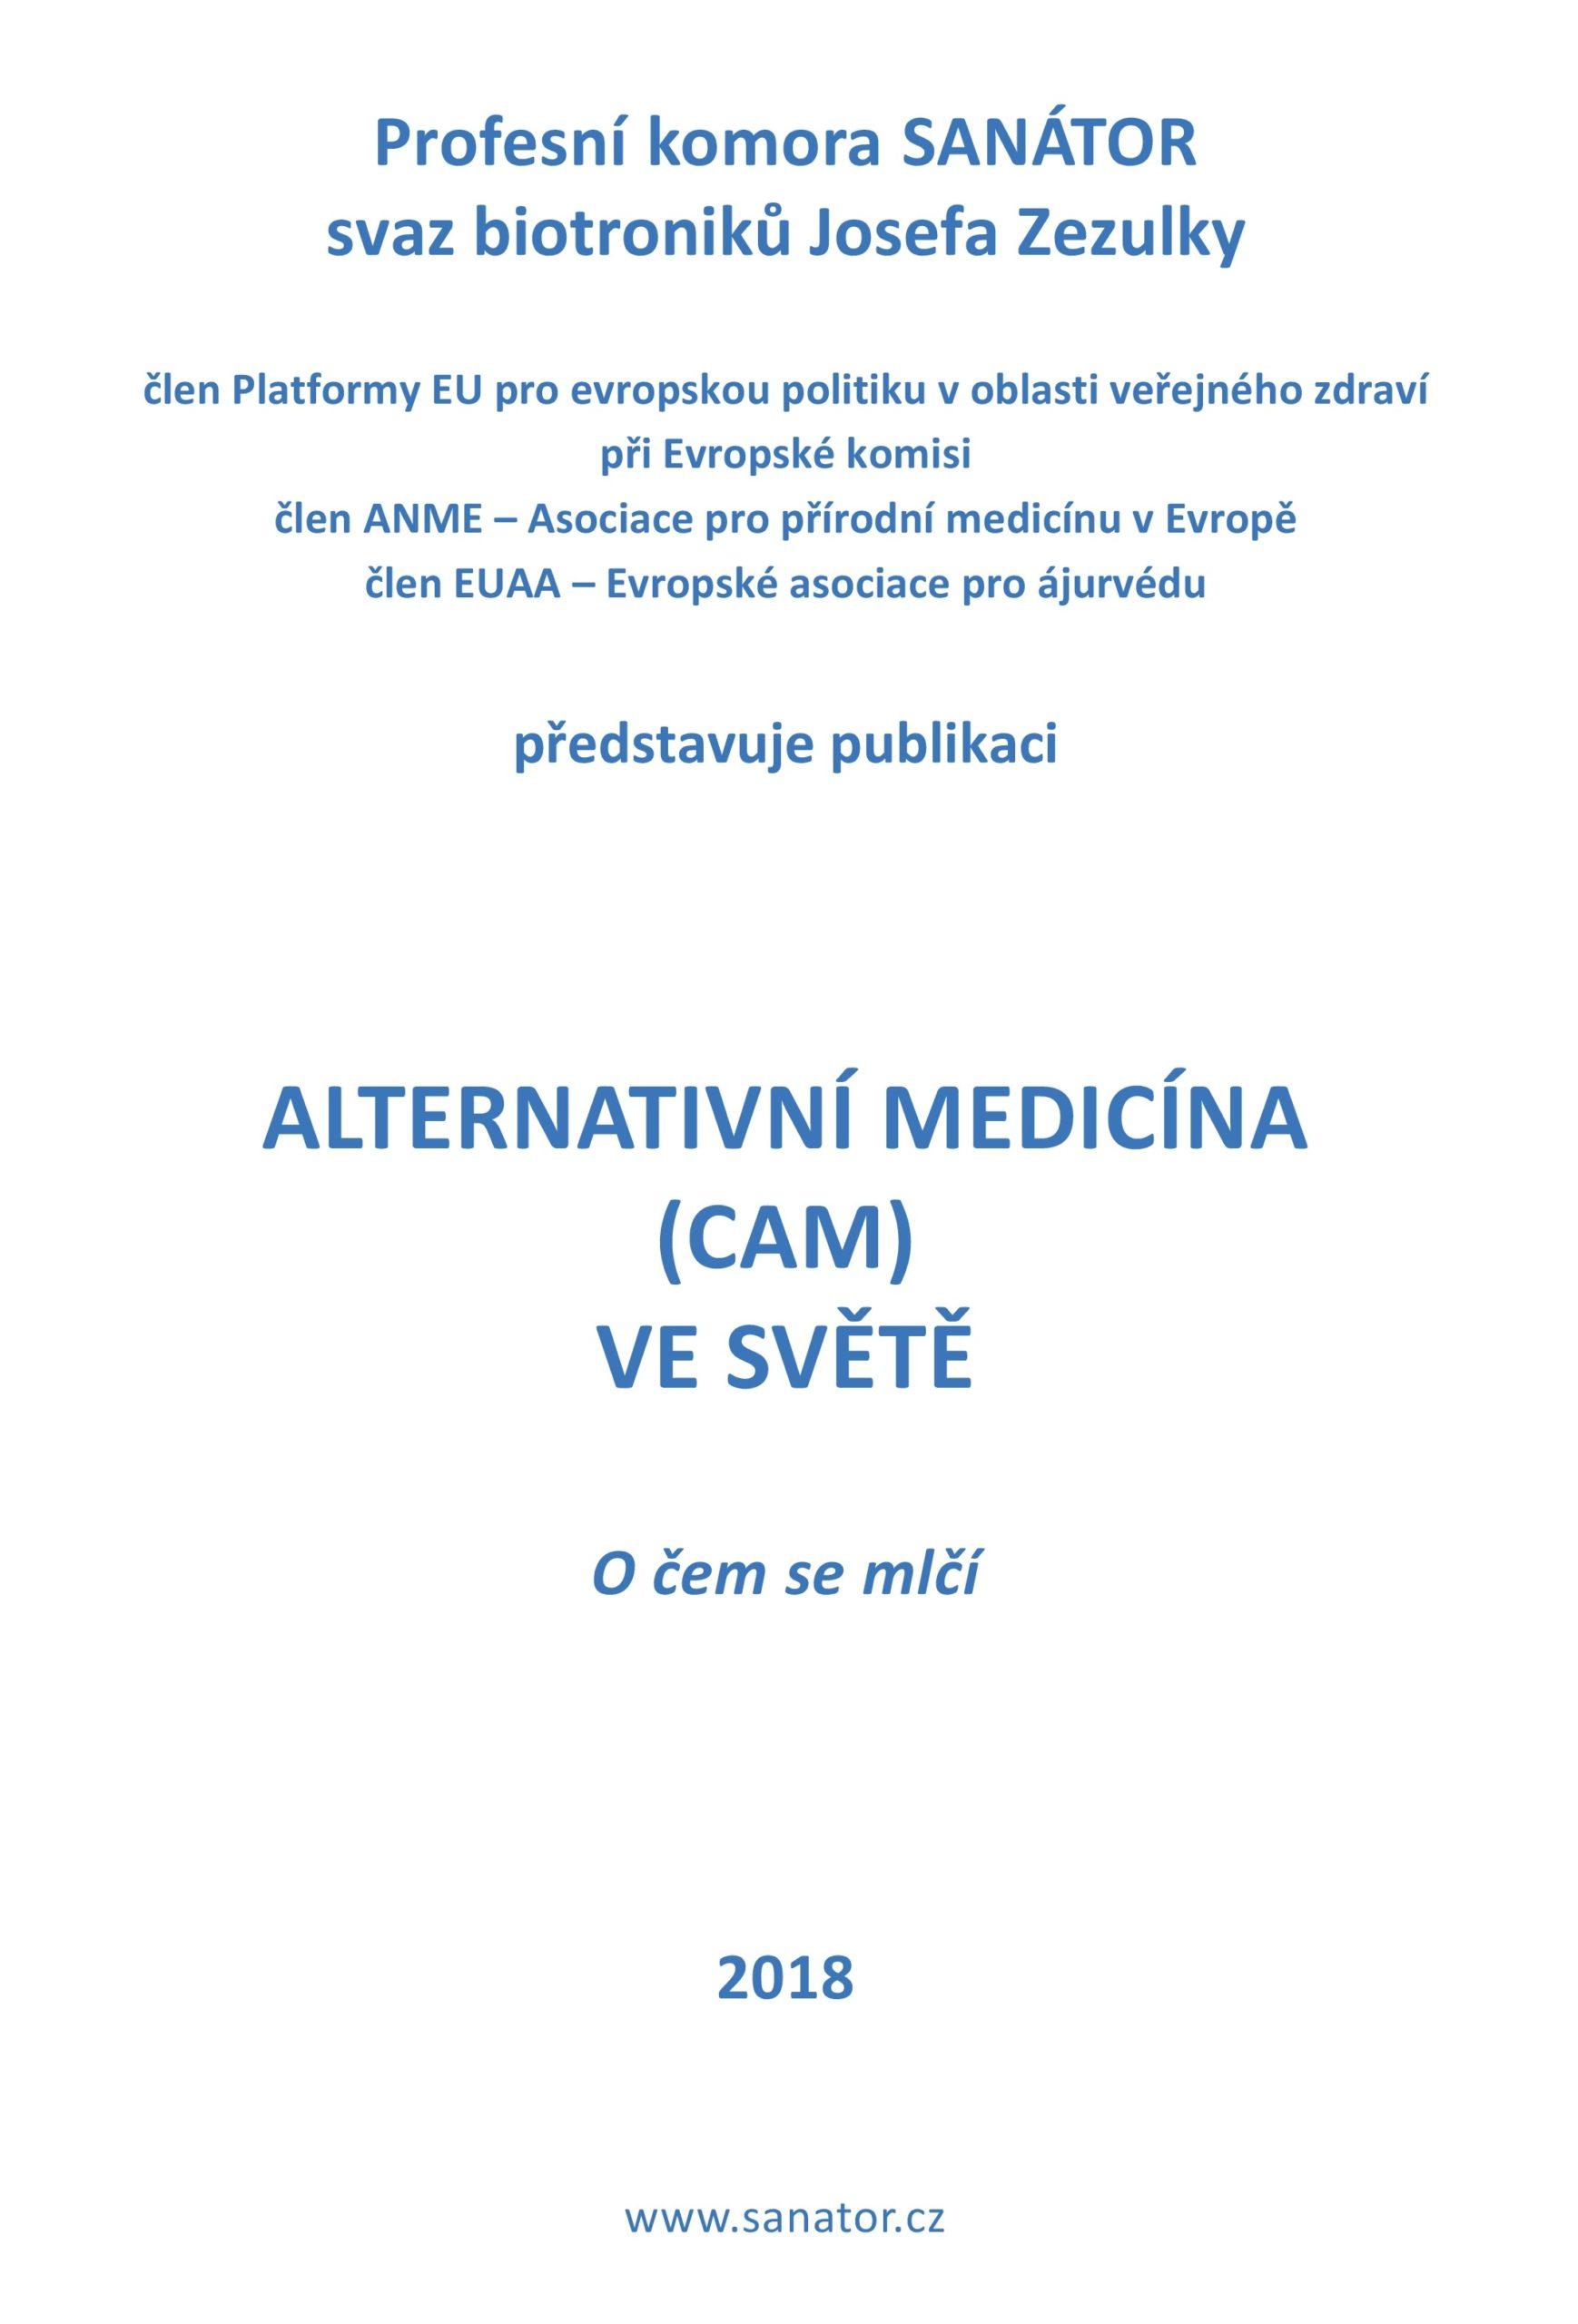 Alternativni medicina CAM ve svete scaled